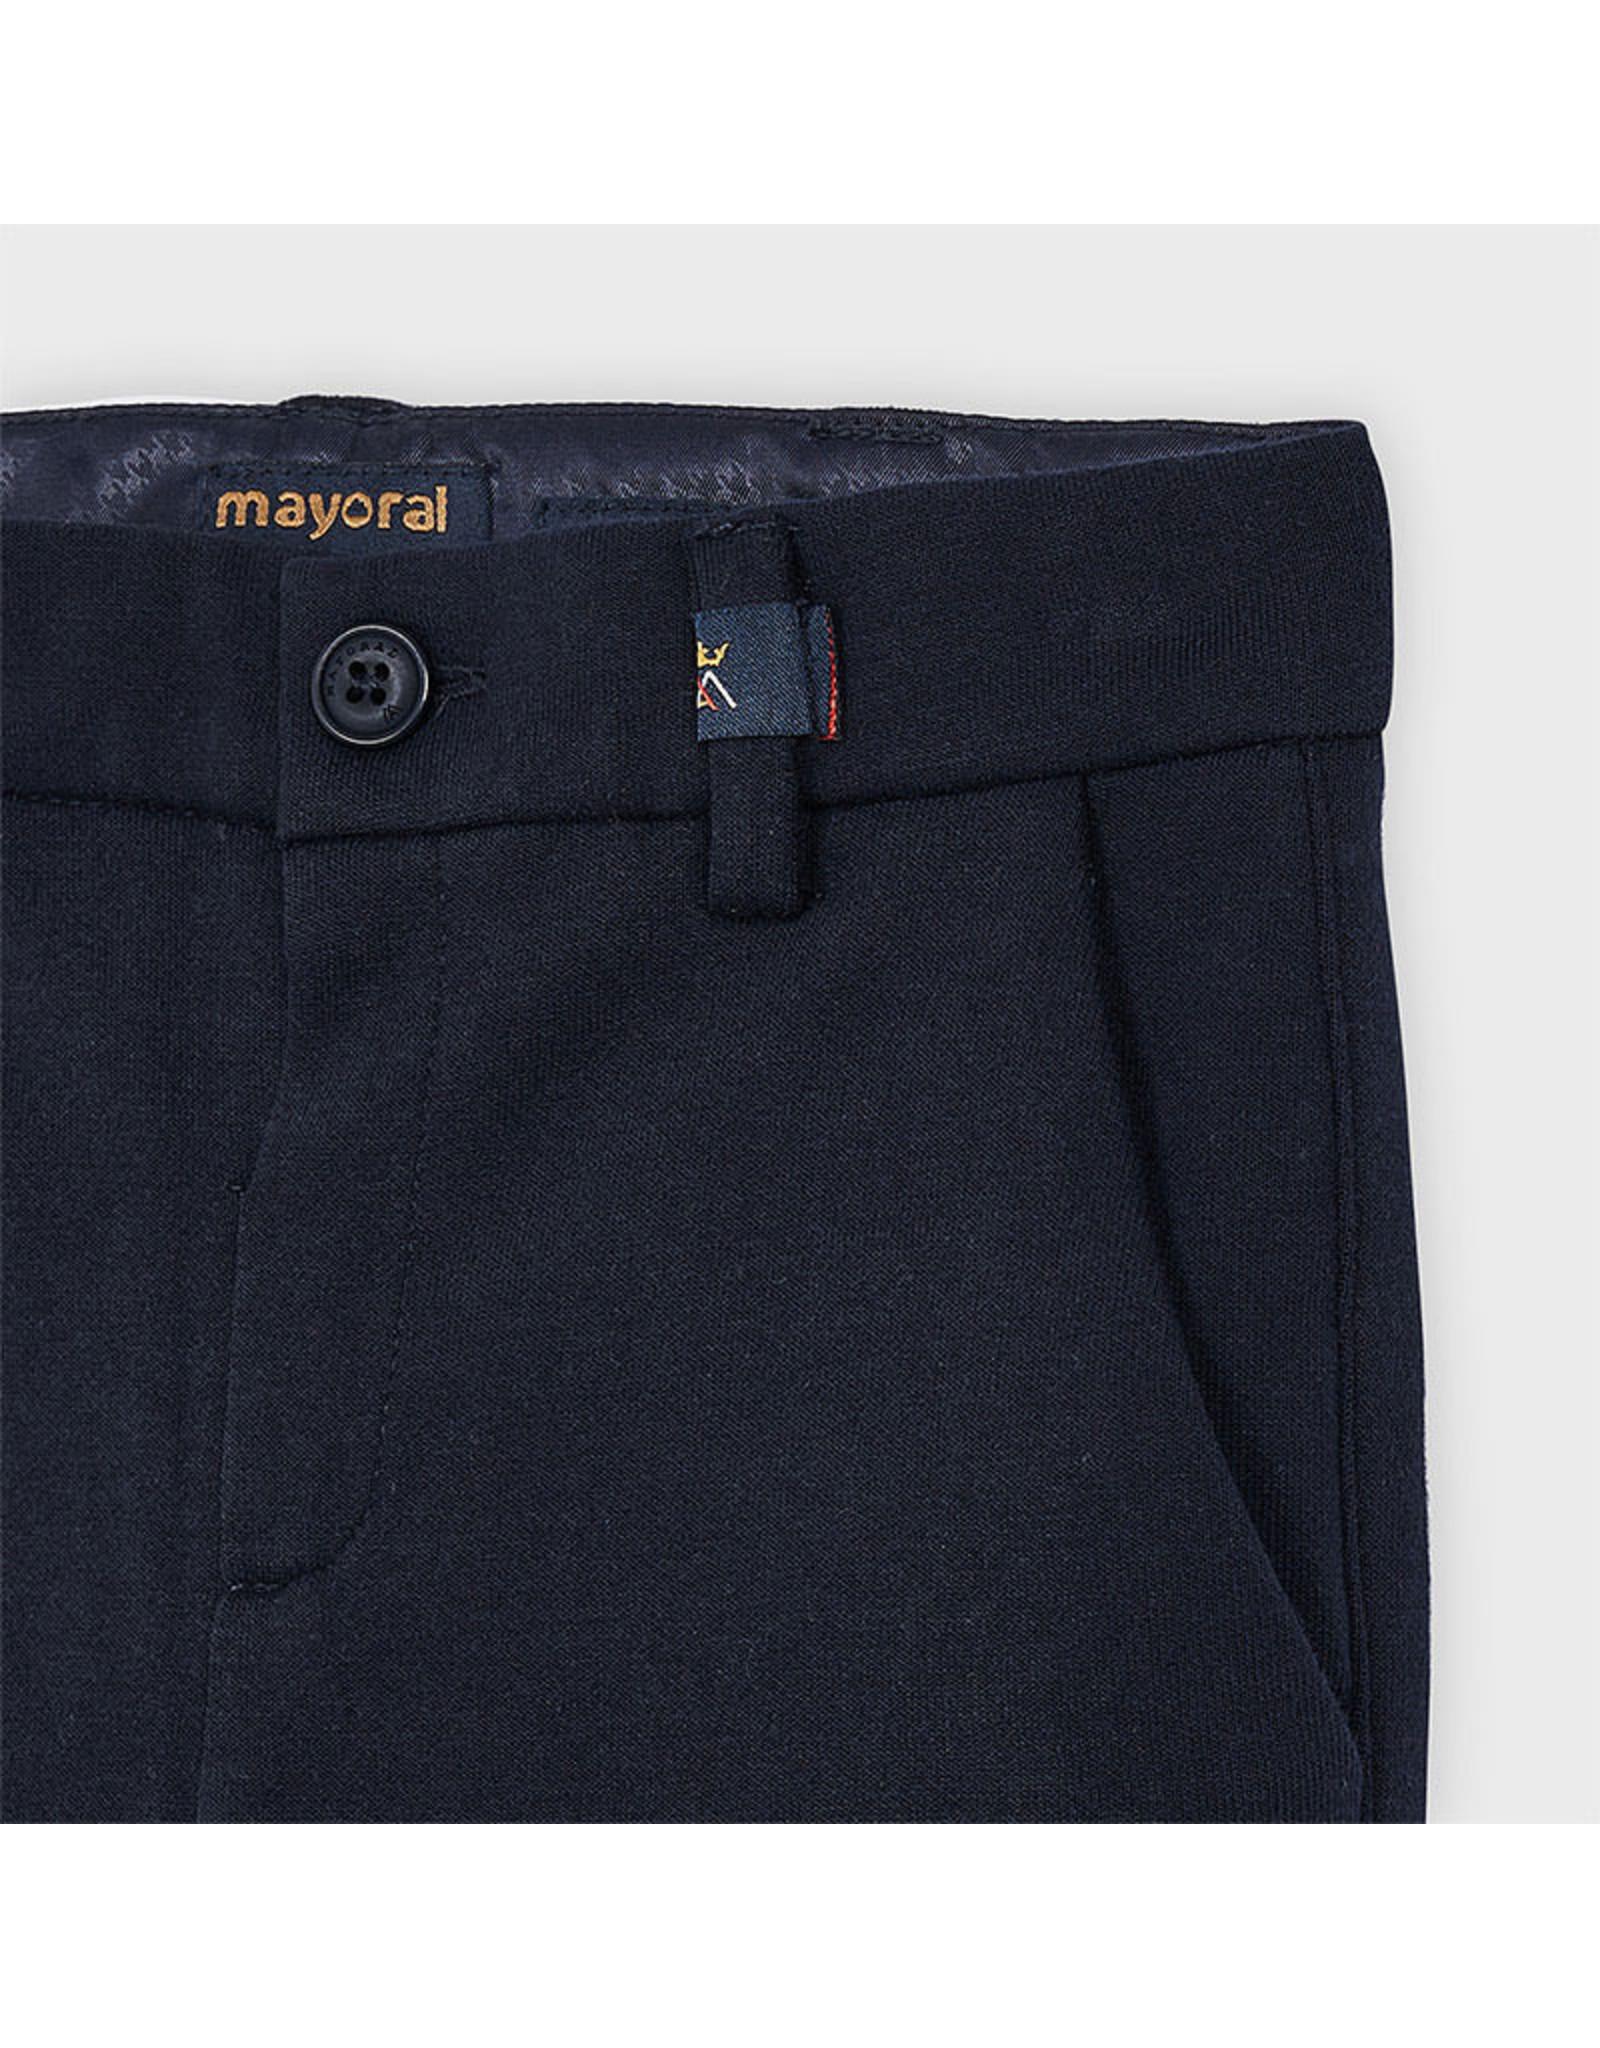 Mayoral Dressy pants Navy